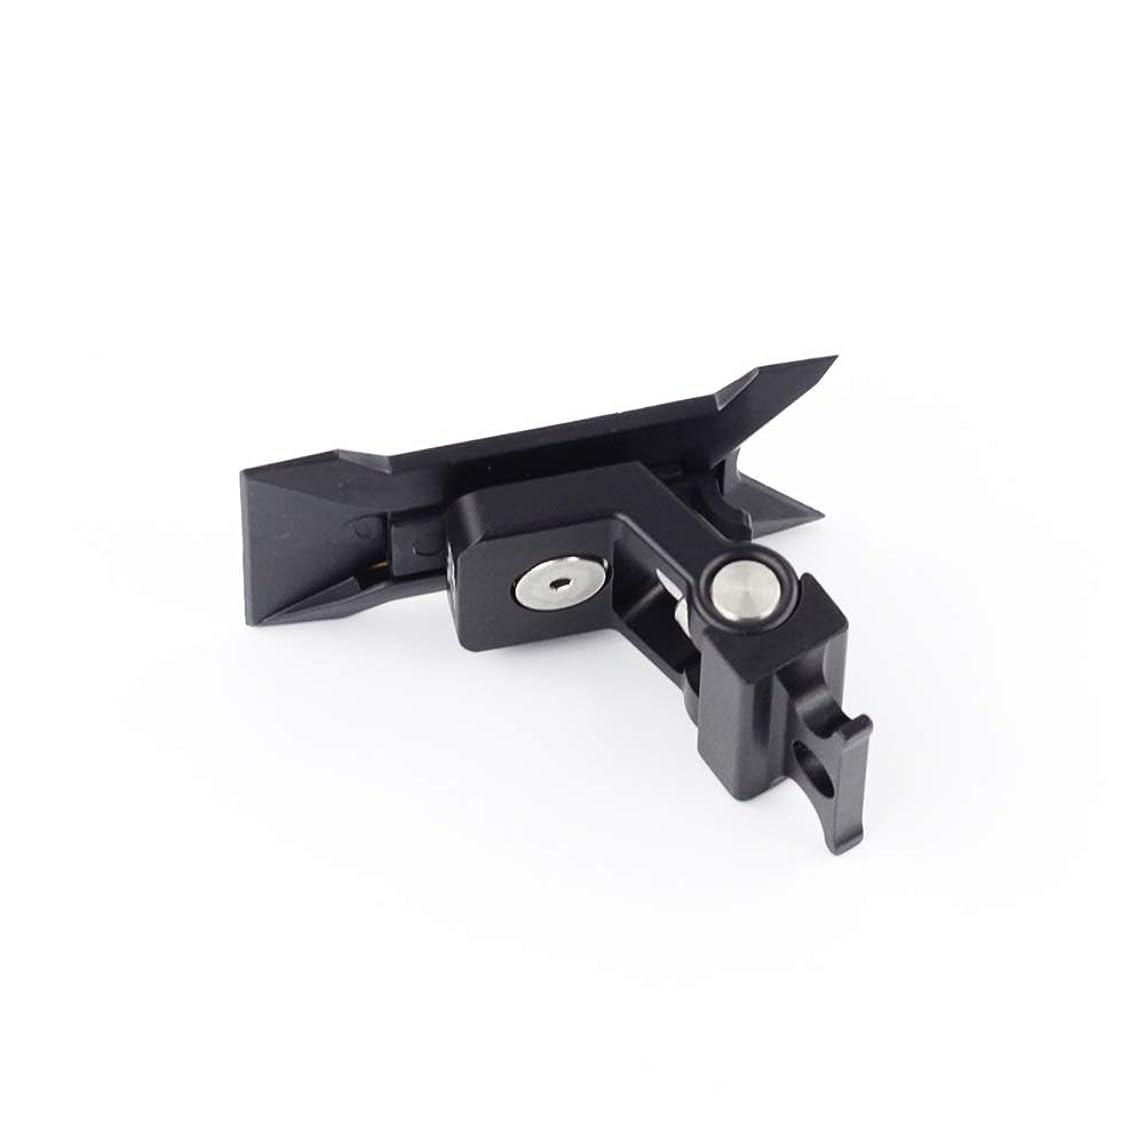 Trigo Mobile Phone Holder for Brompton Folding Bike